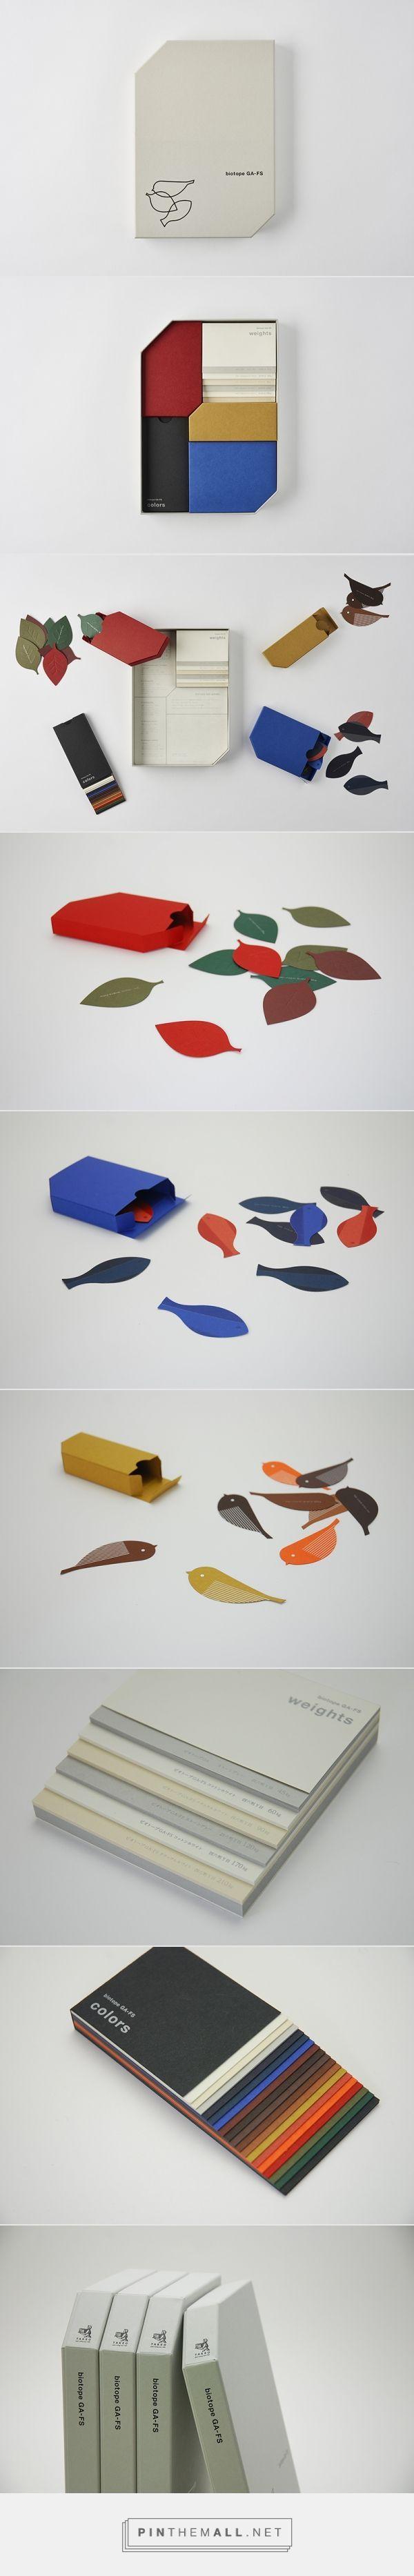 BIOTOPE | DRILL DESIGN - amazing swatch design